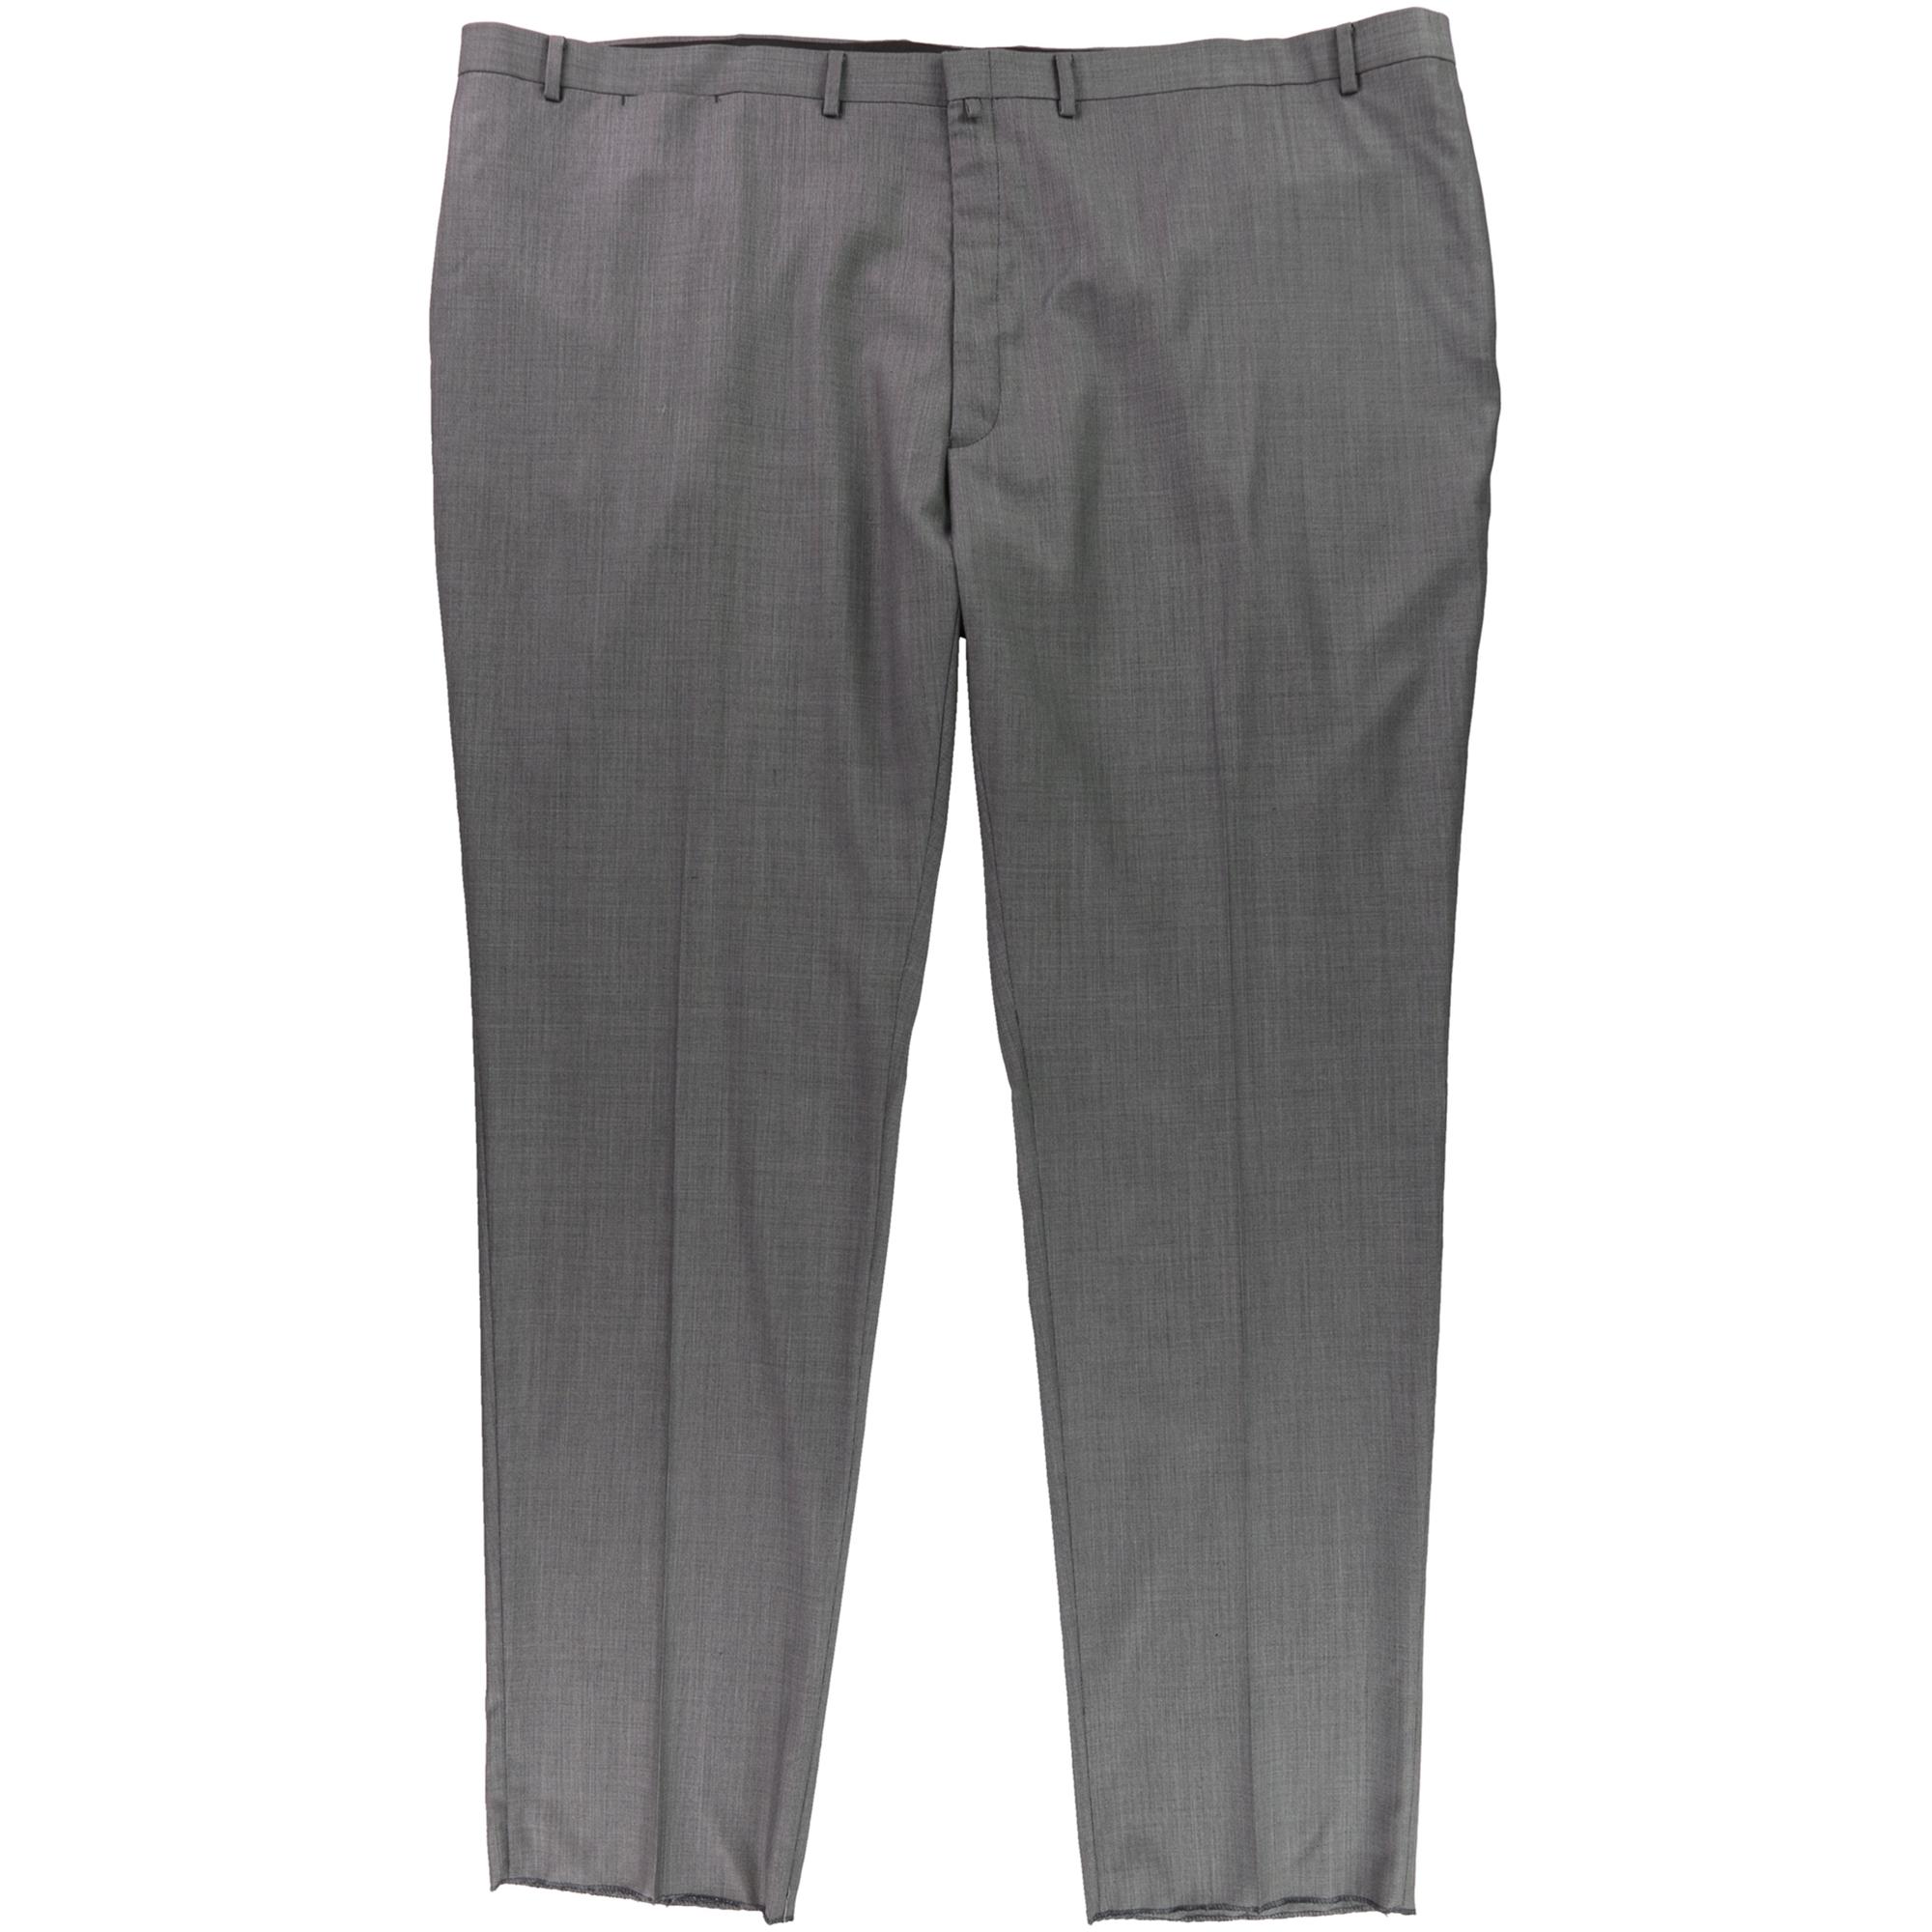 Tags Weekly Mens Jacquard Dress Pant Slacks